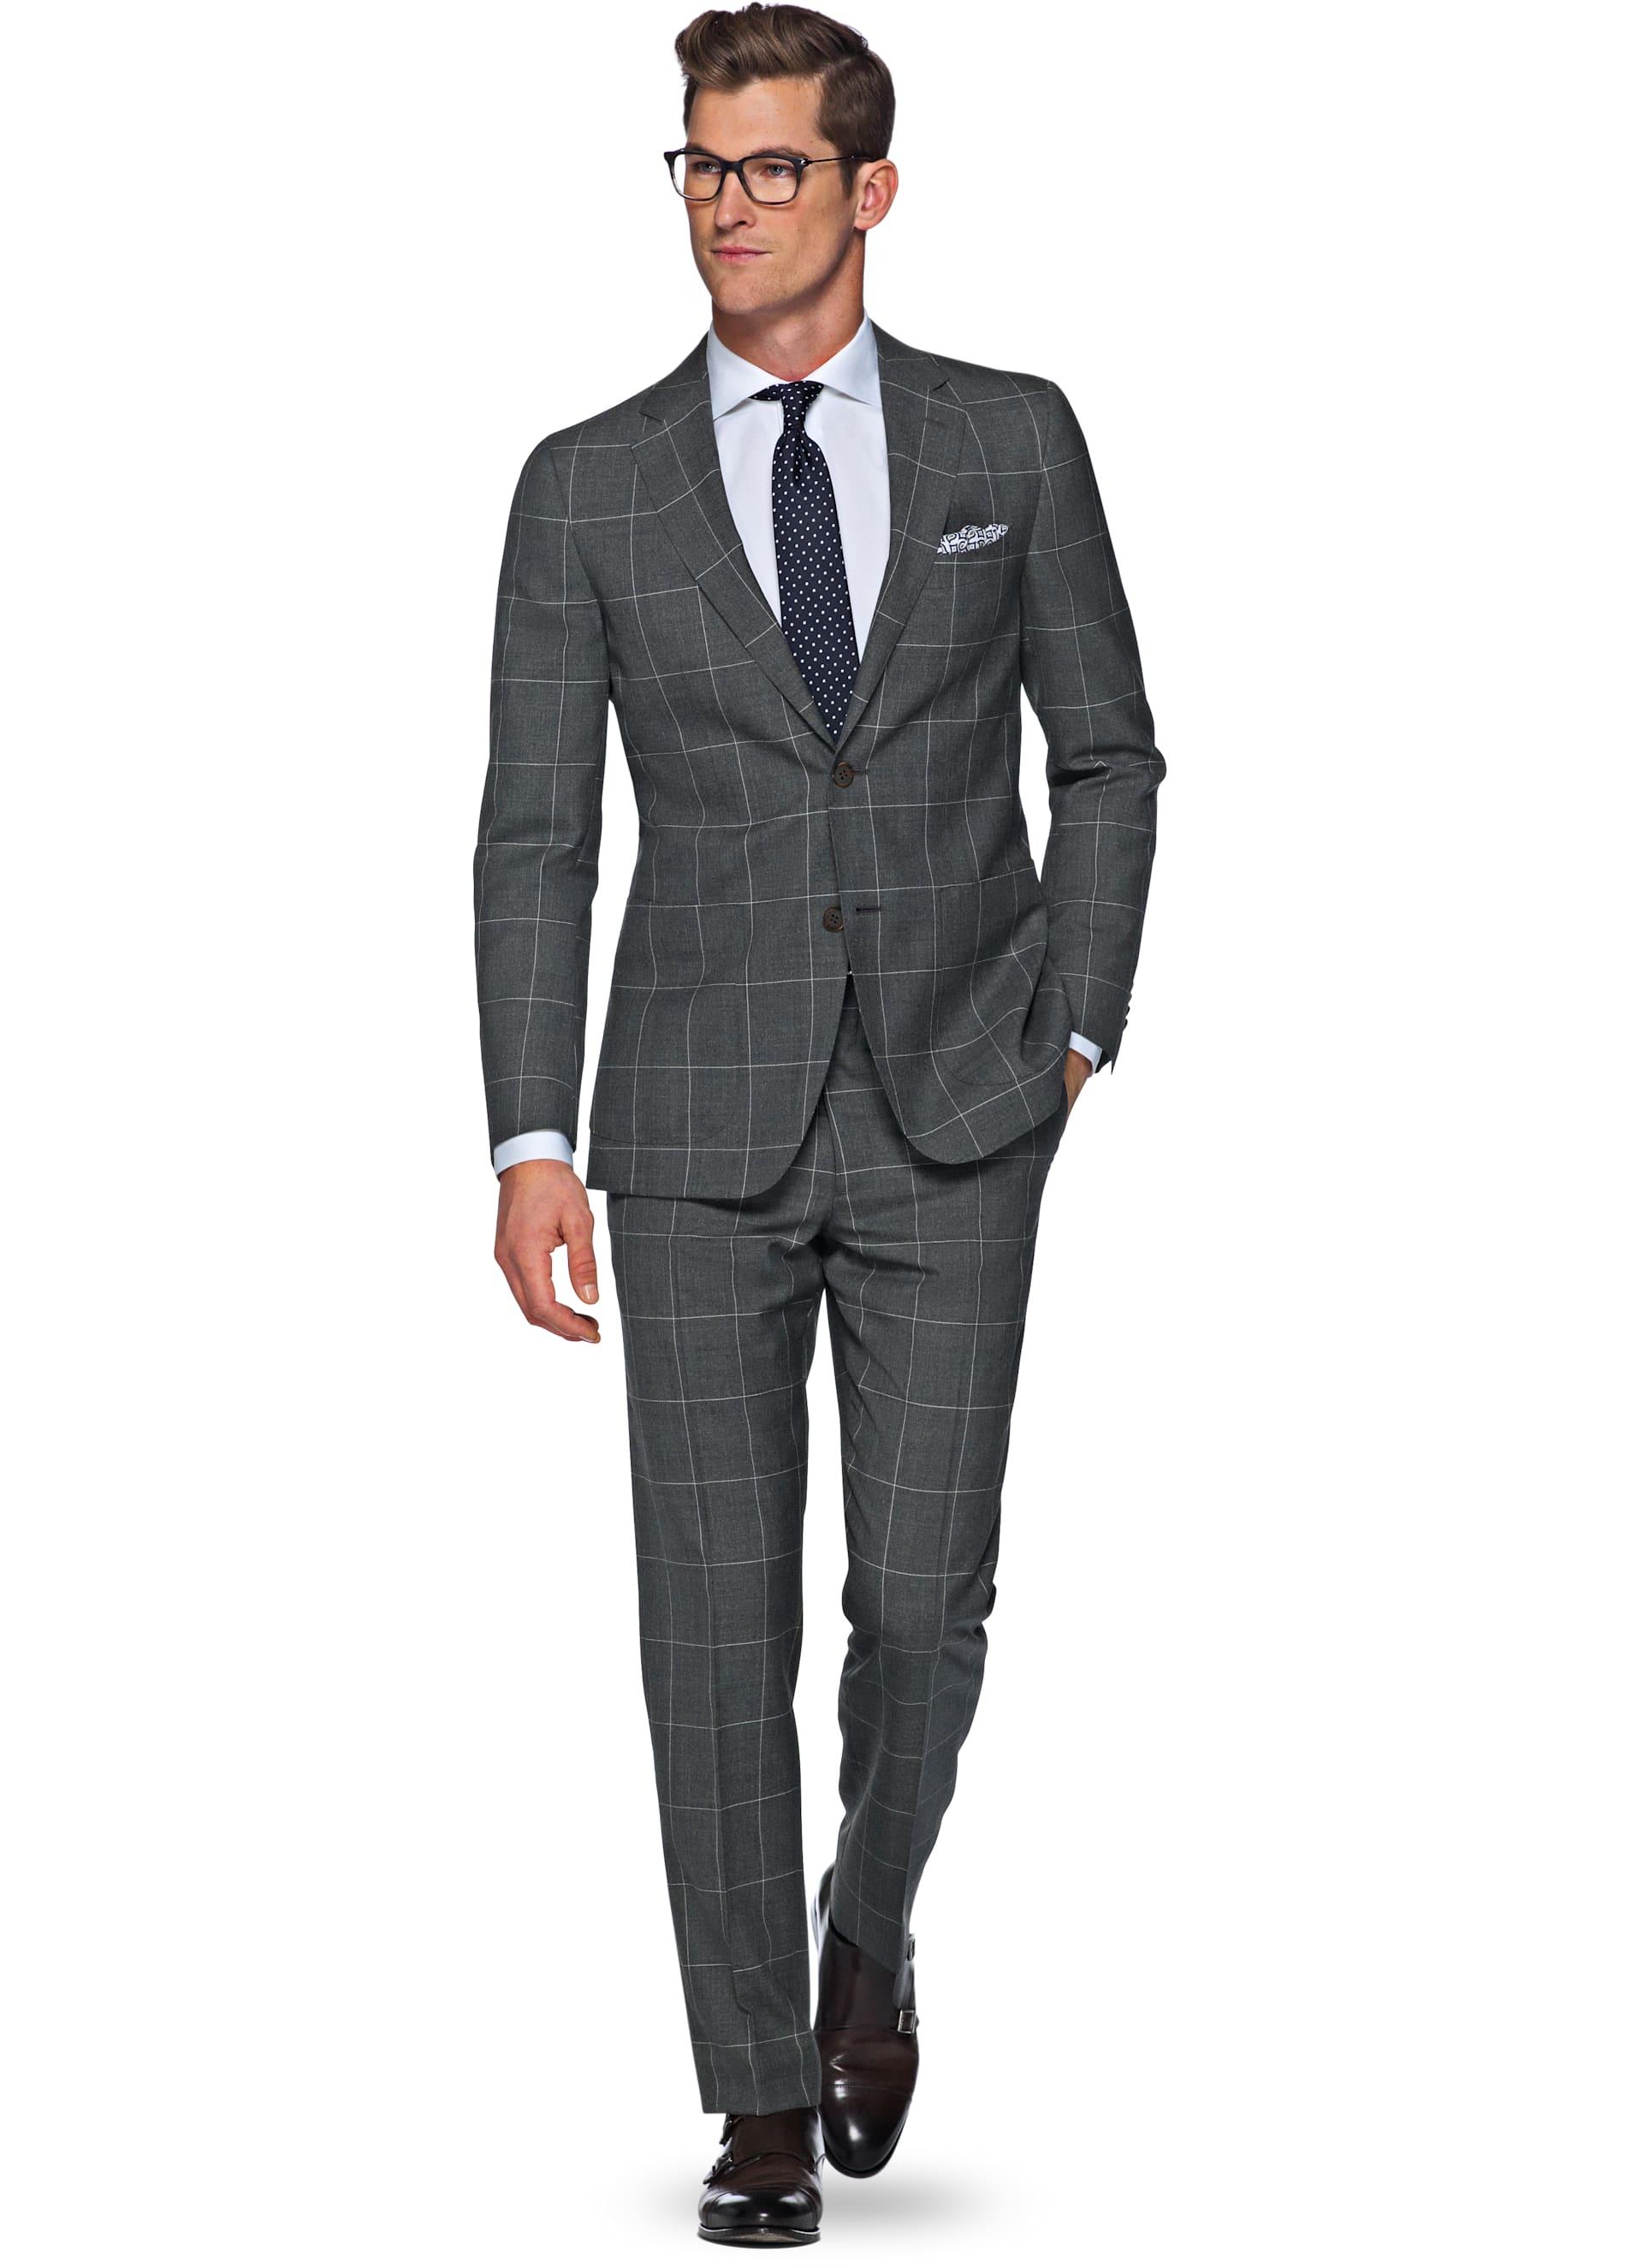 Suit Grey Check Havana P4876 | Suitsupply Online Store